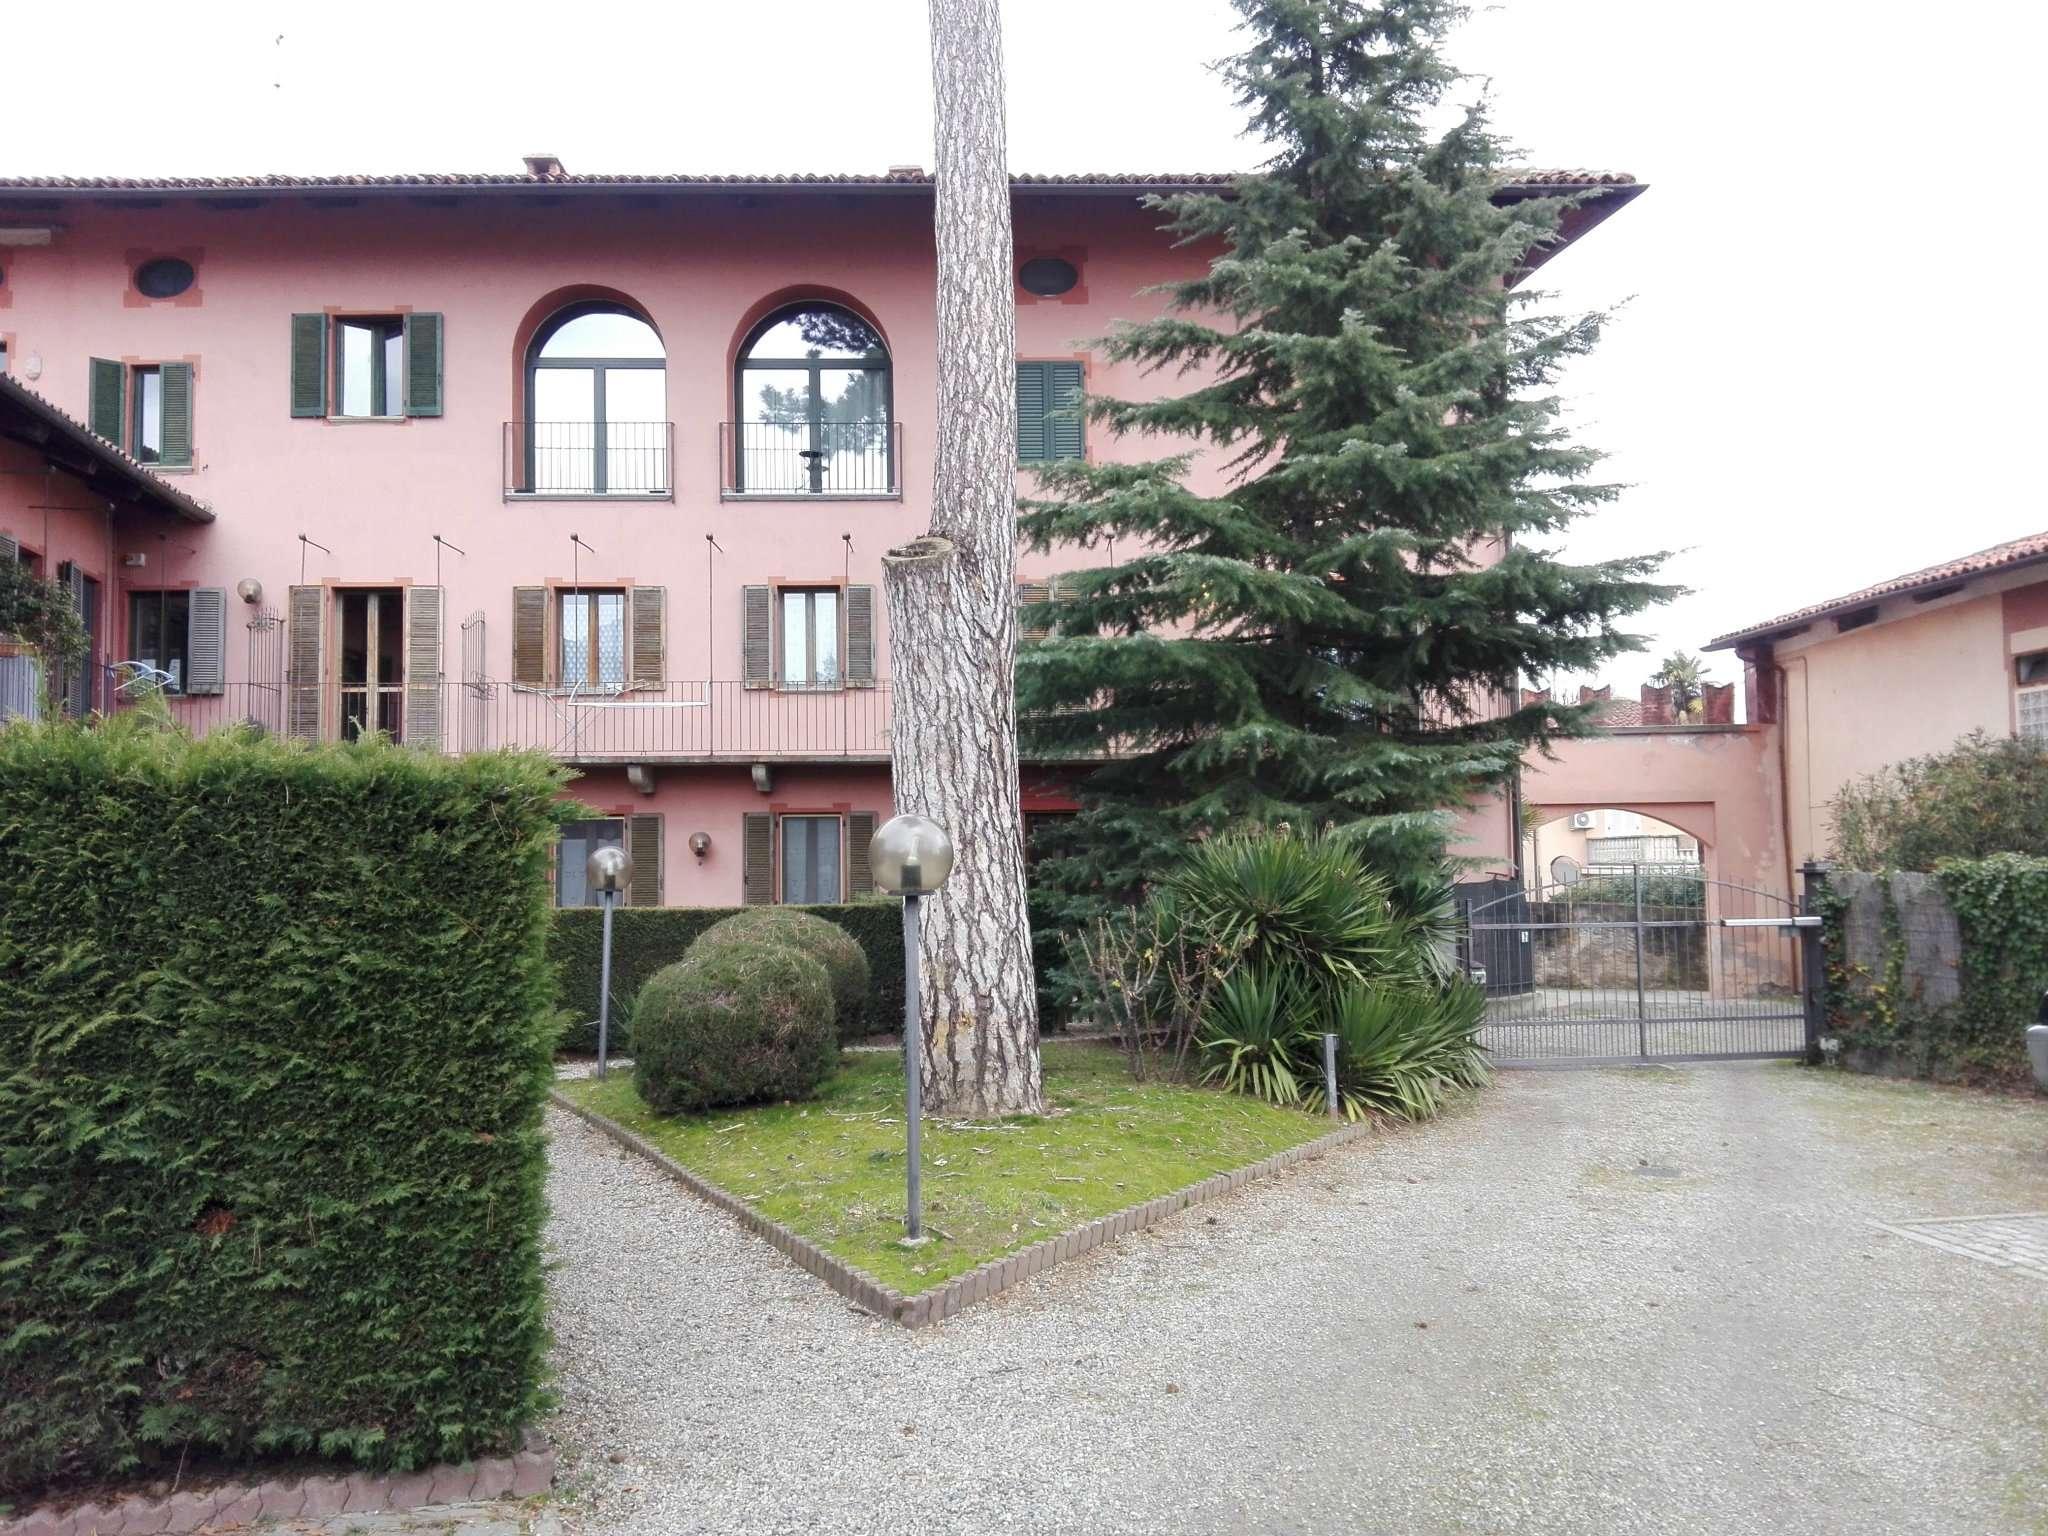 Appartamento in Vendita a Cumiana: 3 locali, 96 mq